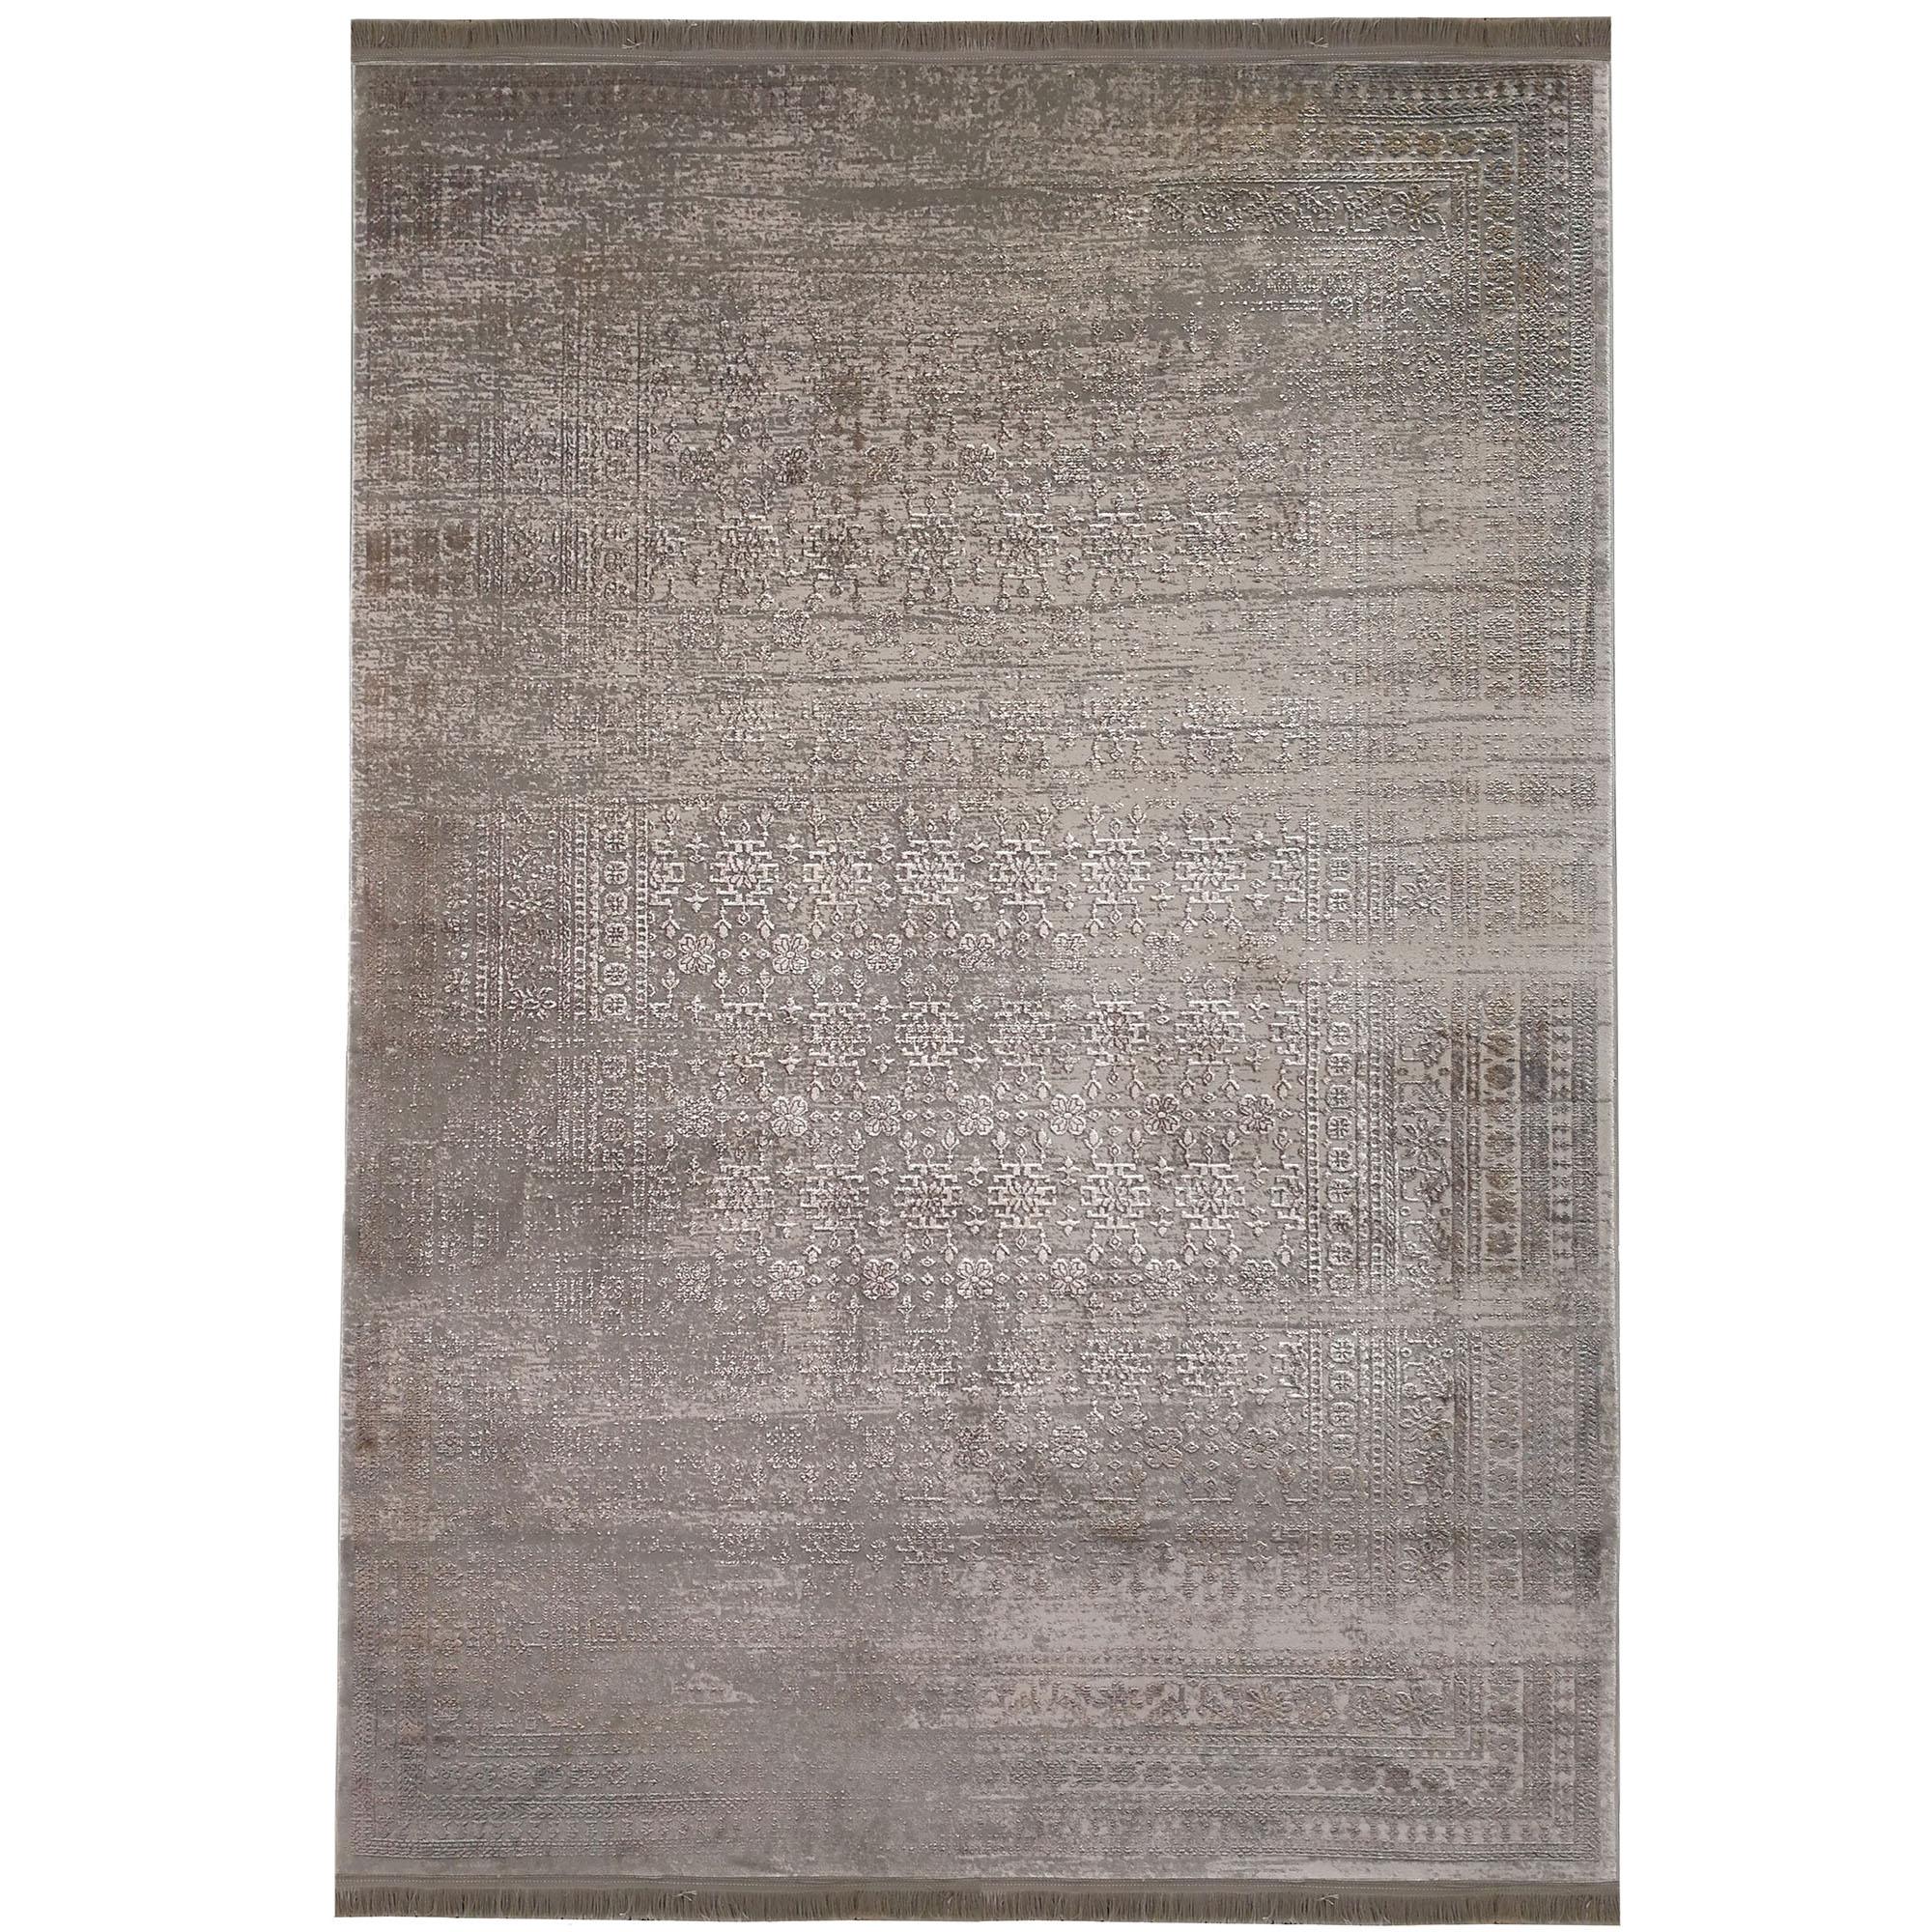 فرش ماشینی زمرد مشهد طرح پتینه کد TA104 زمینه طوسی